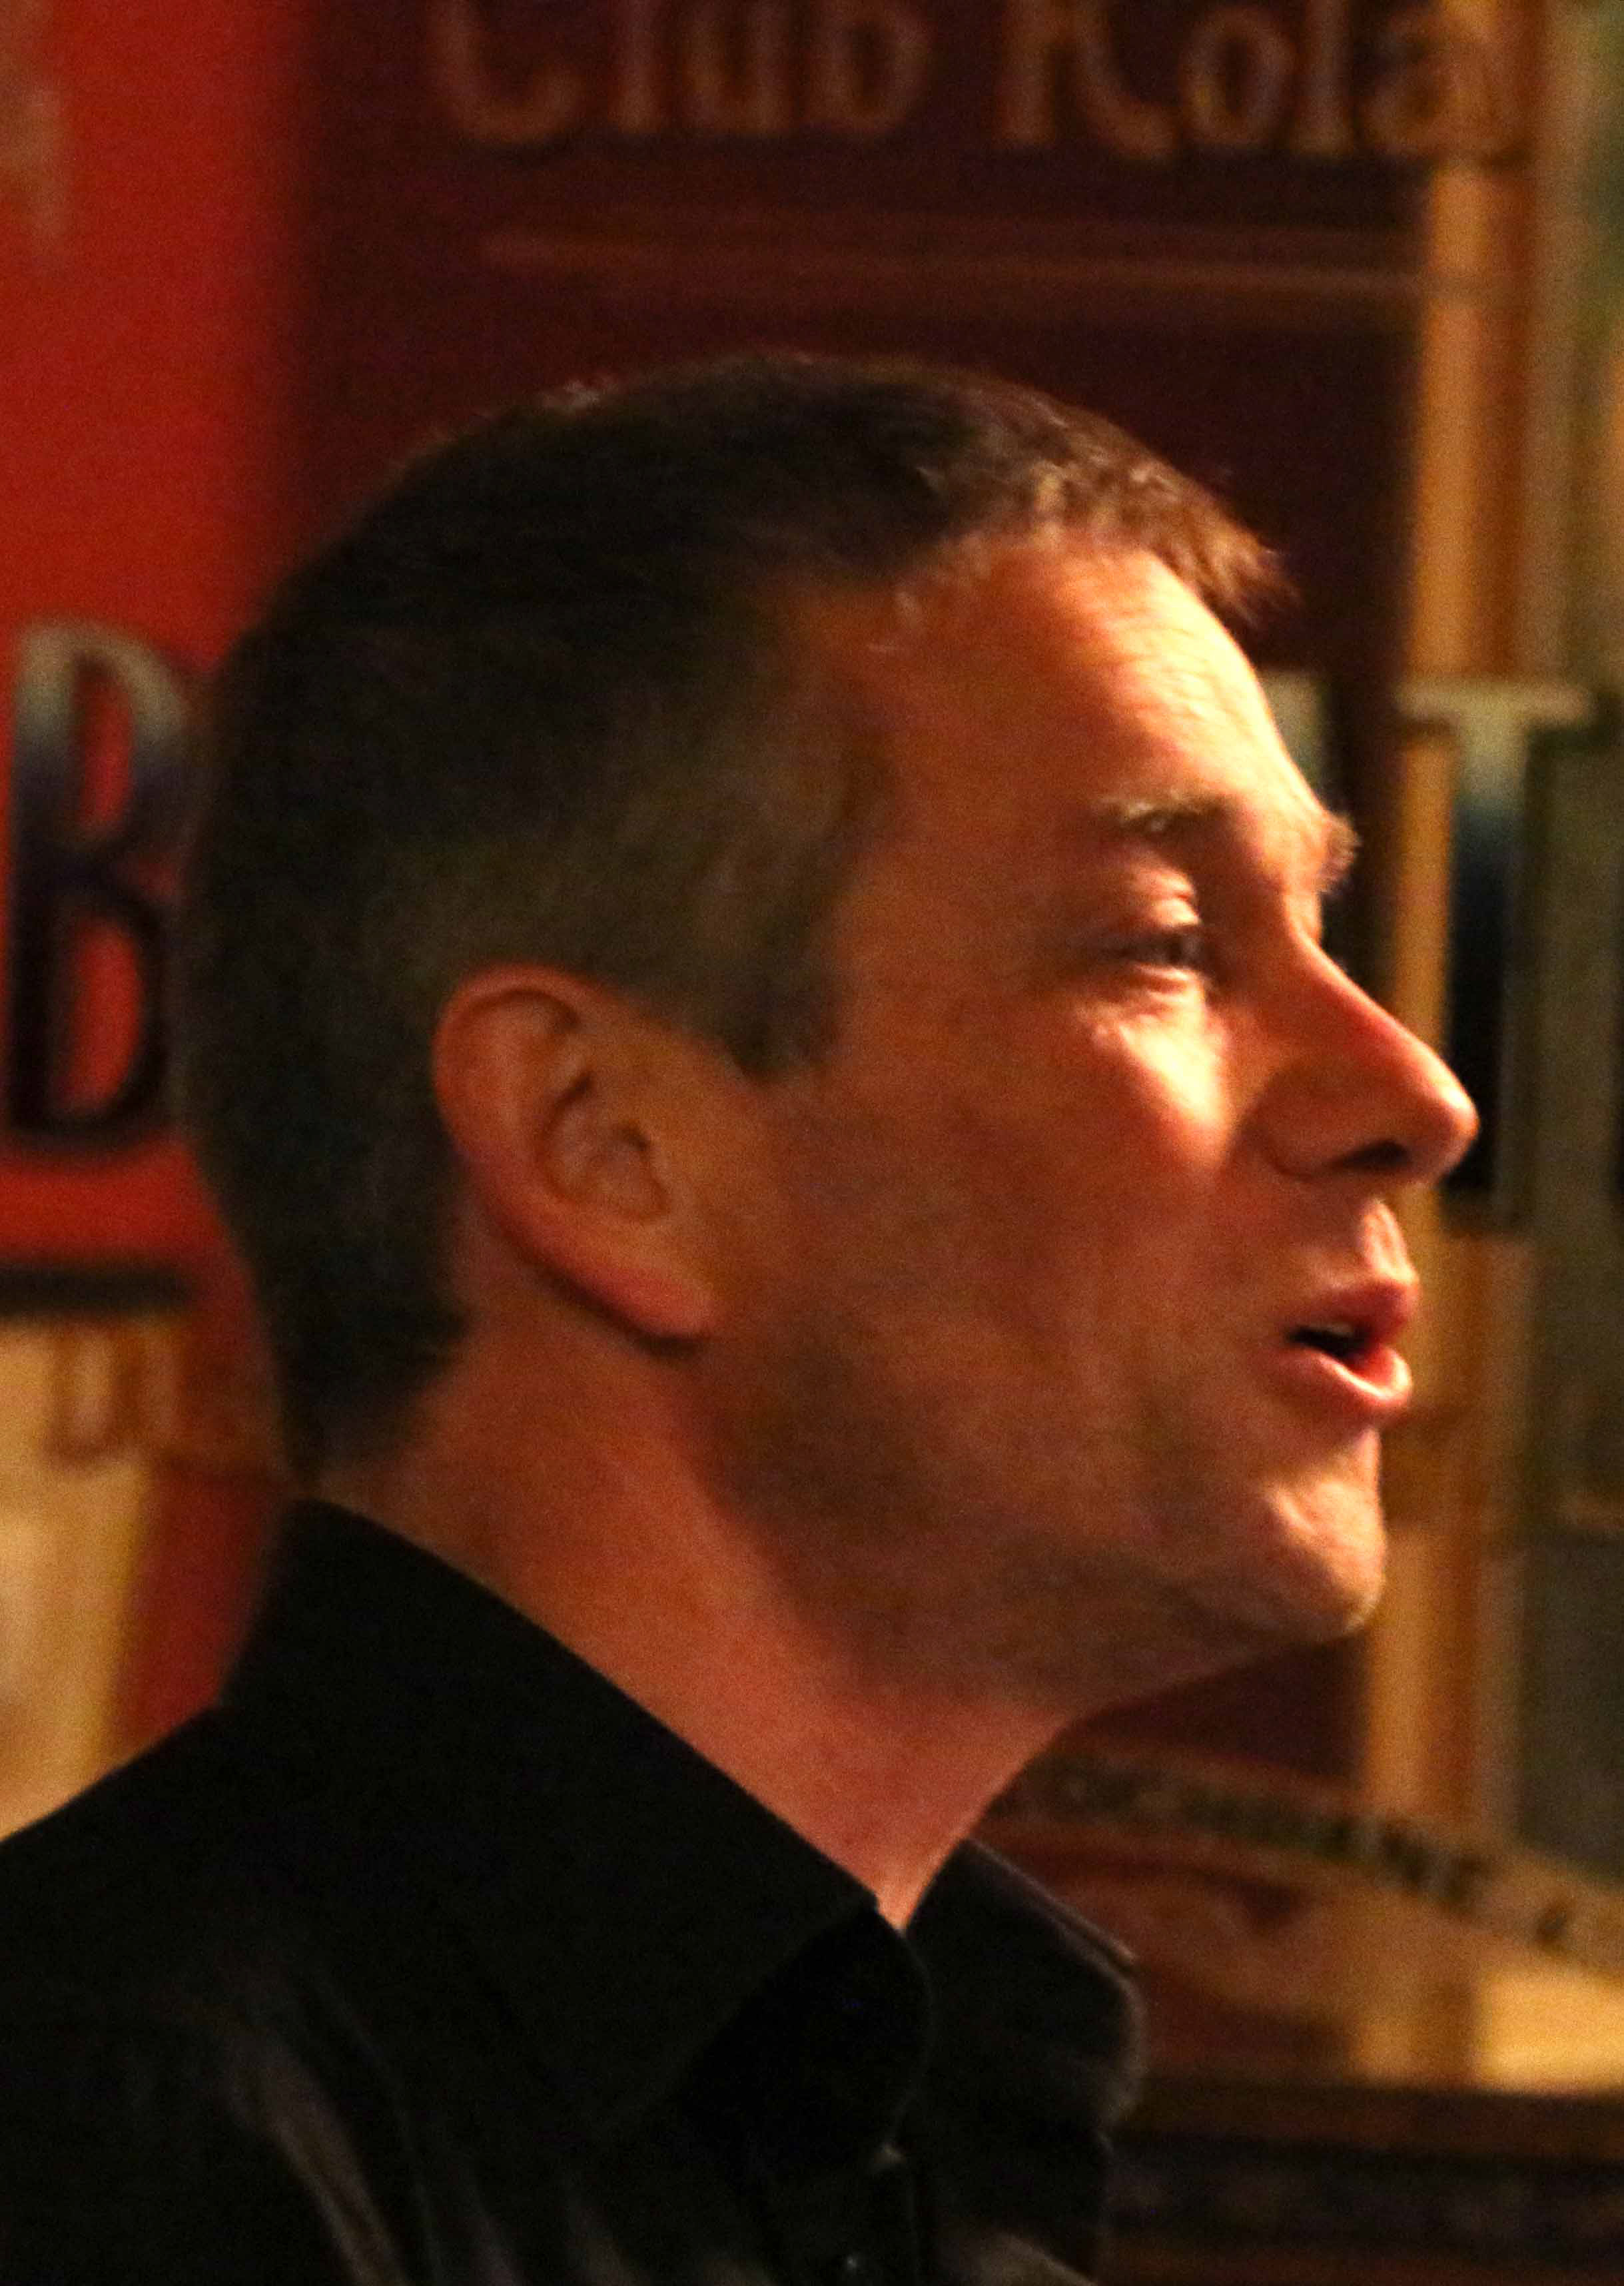 Allingham Festival Club - Mc Intyre's Saloon, Ballyshannon - Thursday Nov. 3rd 2016-2.jpg